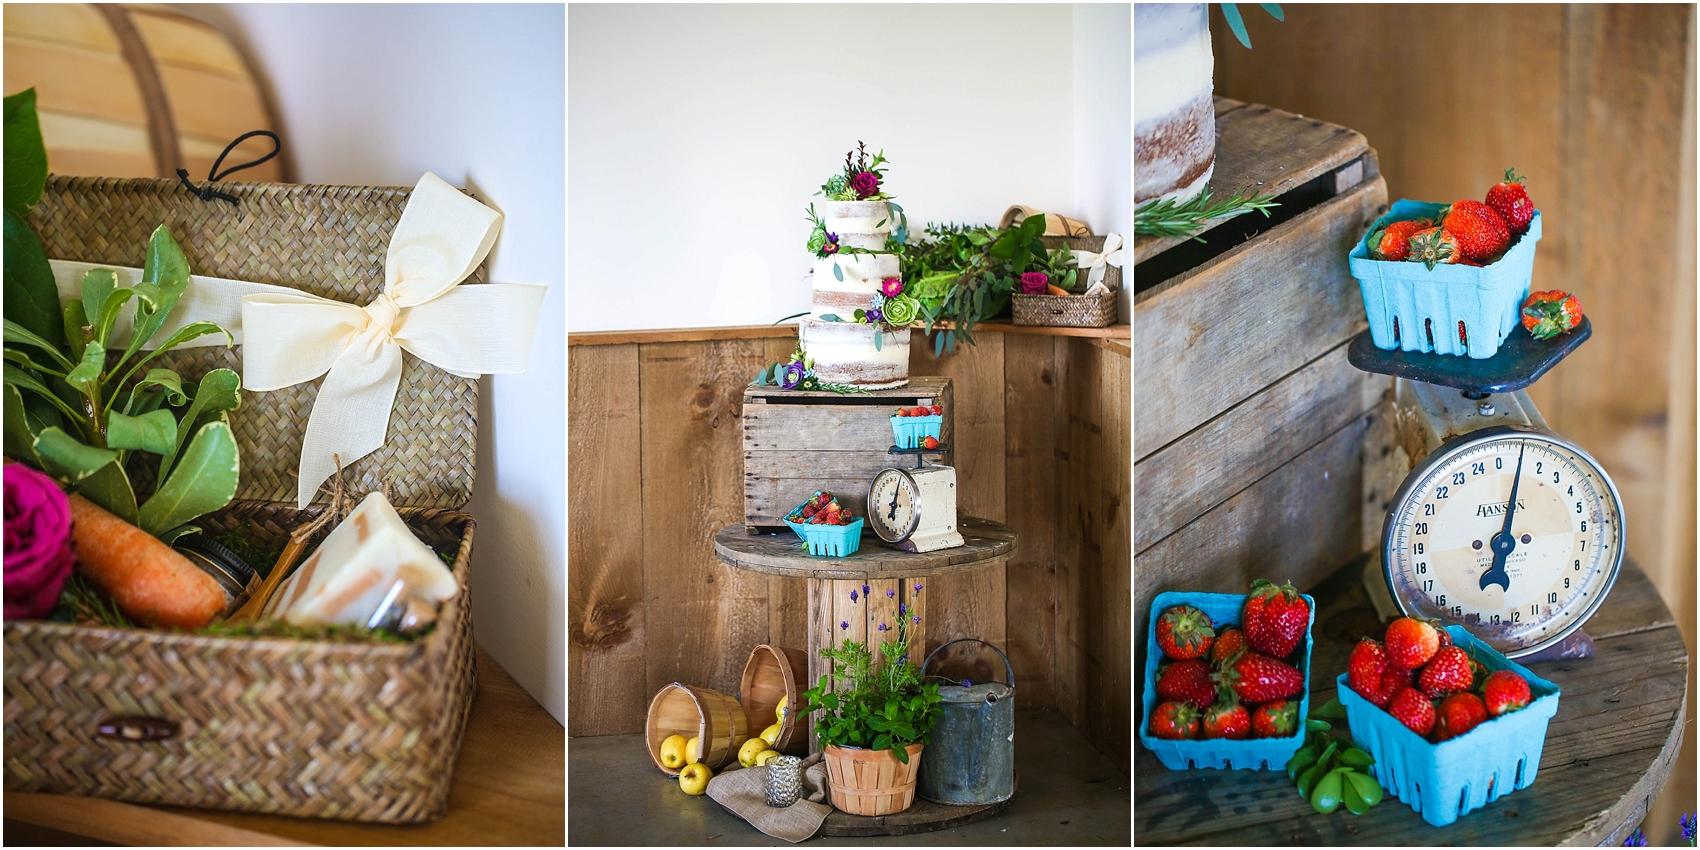 Central_VA_Barn_at_Edgewood_Farm_Farm_to_Table_Styled_Shoot_0007.jpg